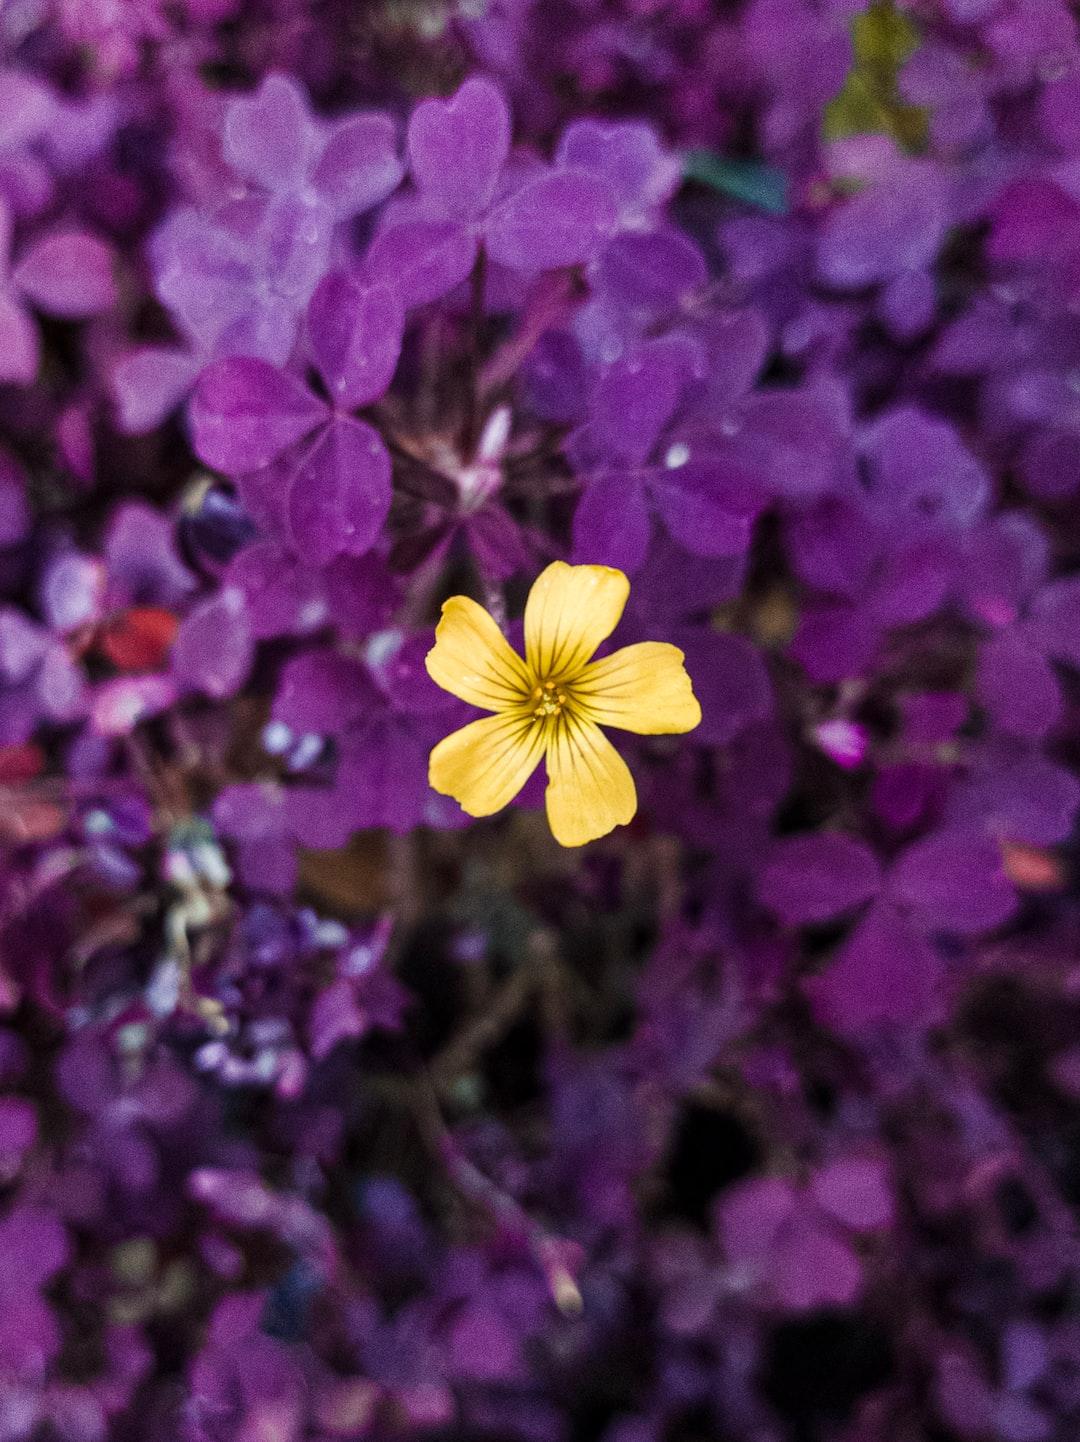 Yellow Flower - Winter Flowers #flower